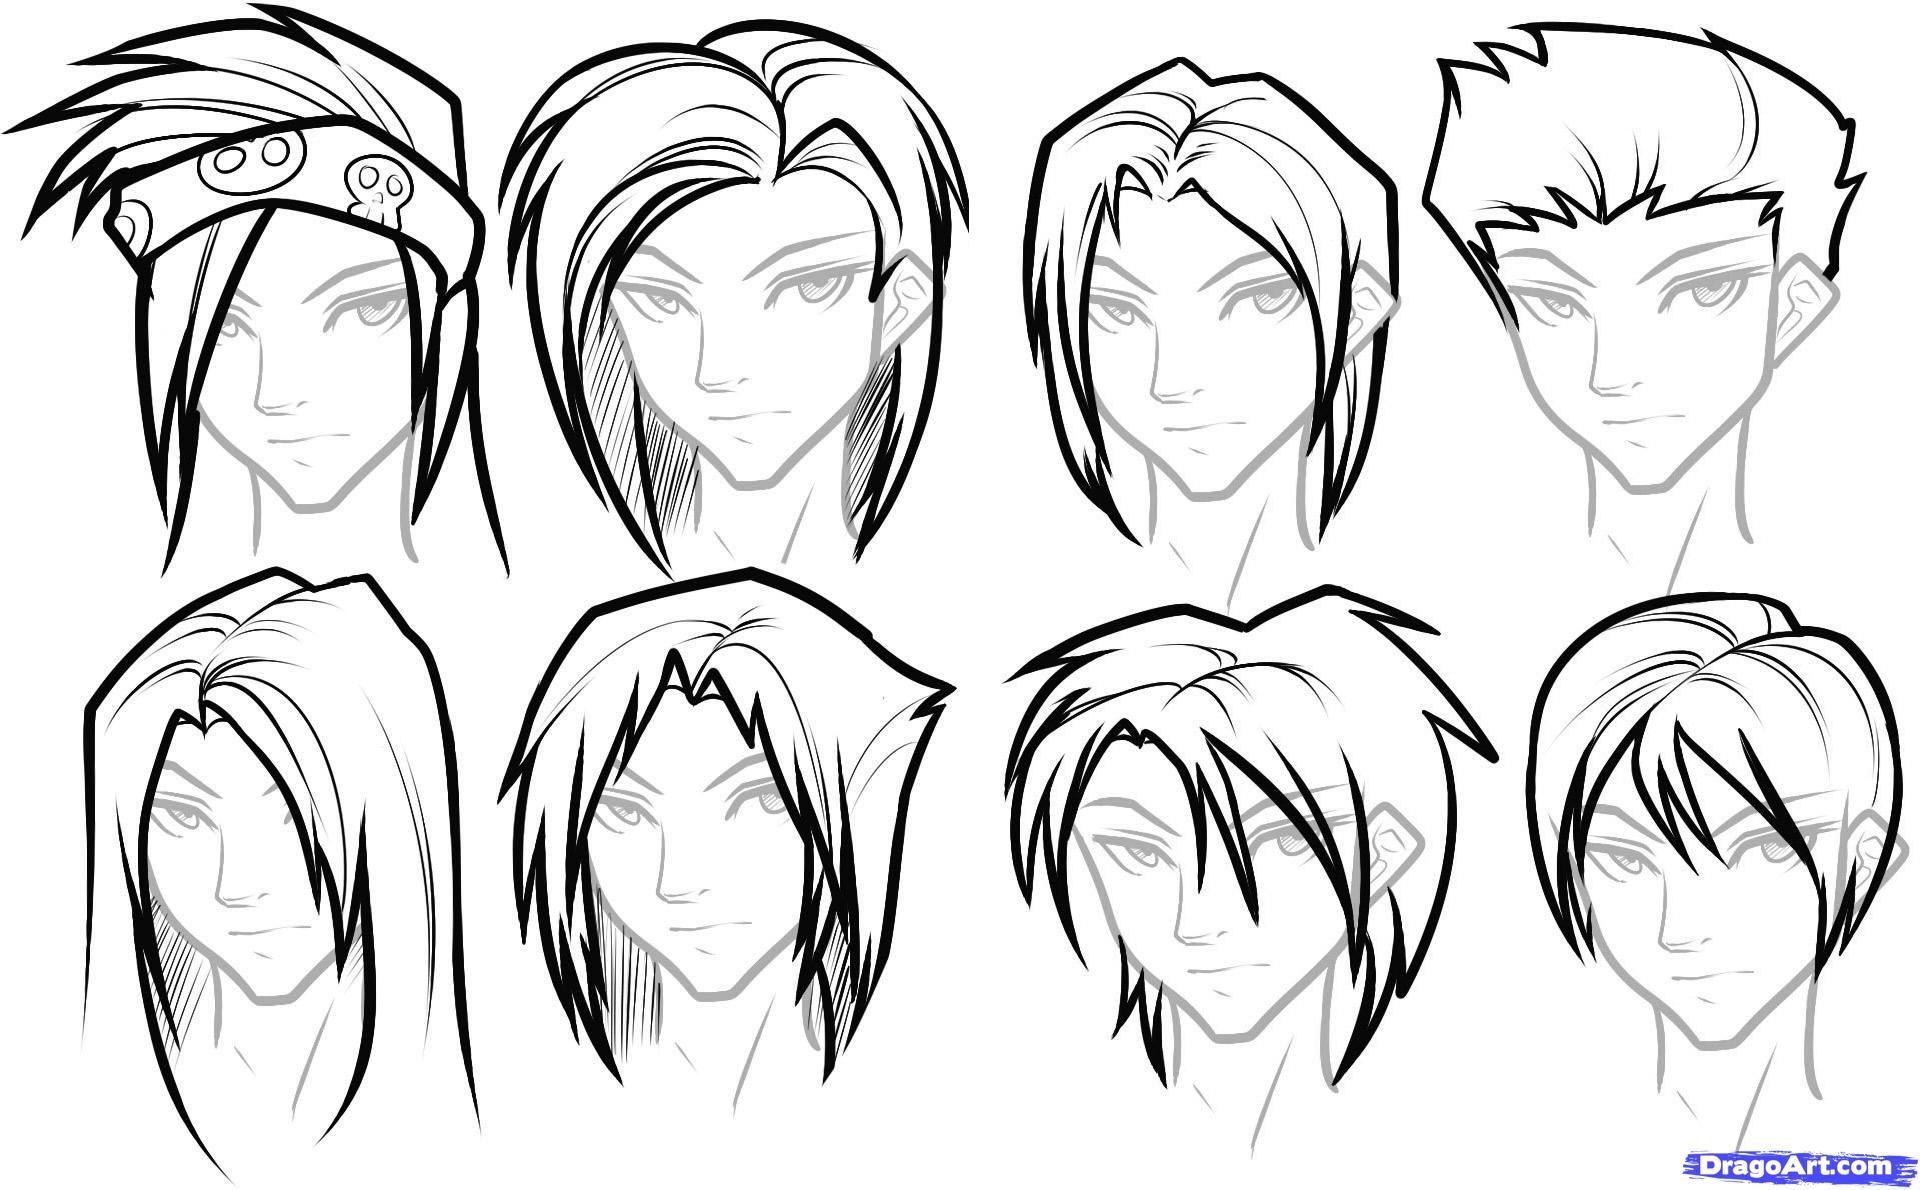 How To Draw Hair For Boys Step 14 1920x1190 Anime Boy Hair Manga Hair Anime Character Drawing